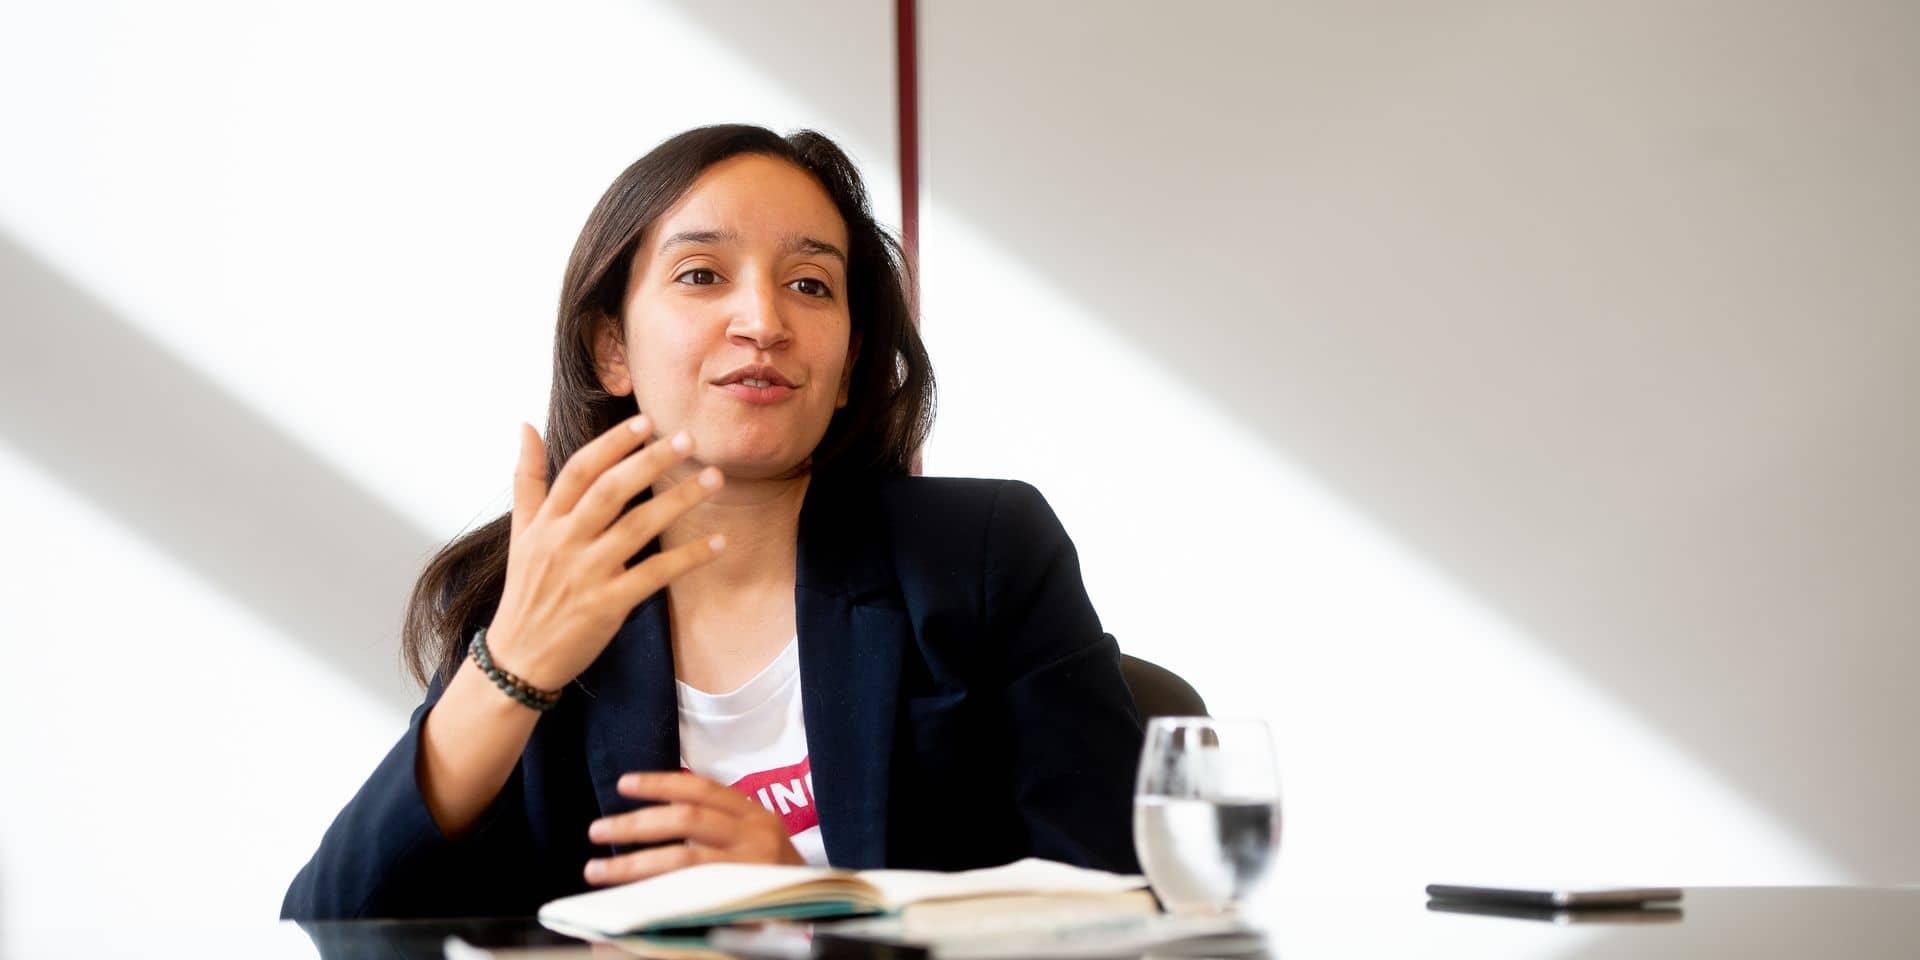 Bruxelles - Chambre des representants - parlement federal: Rajae Maouane (Ecolo) - Copresidente